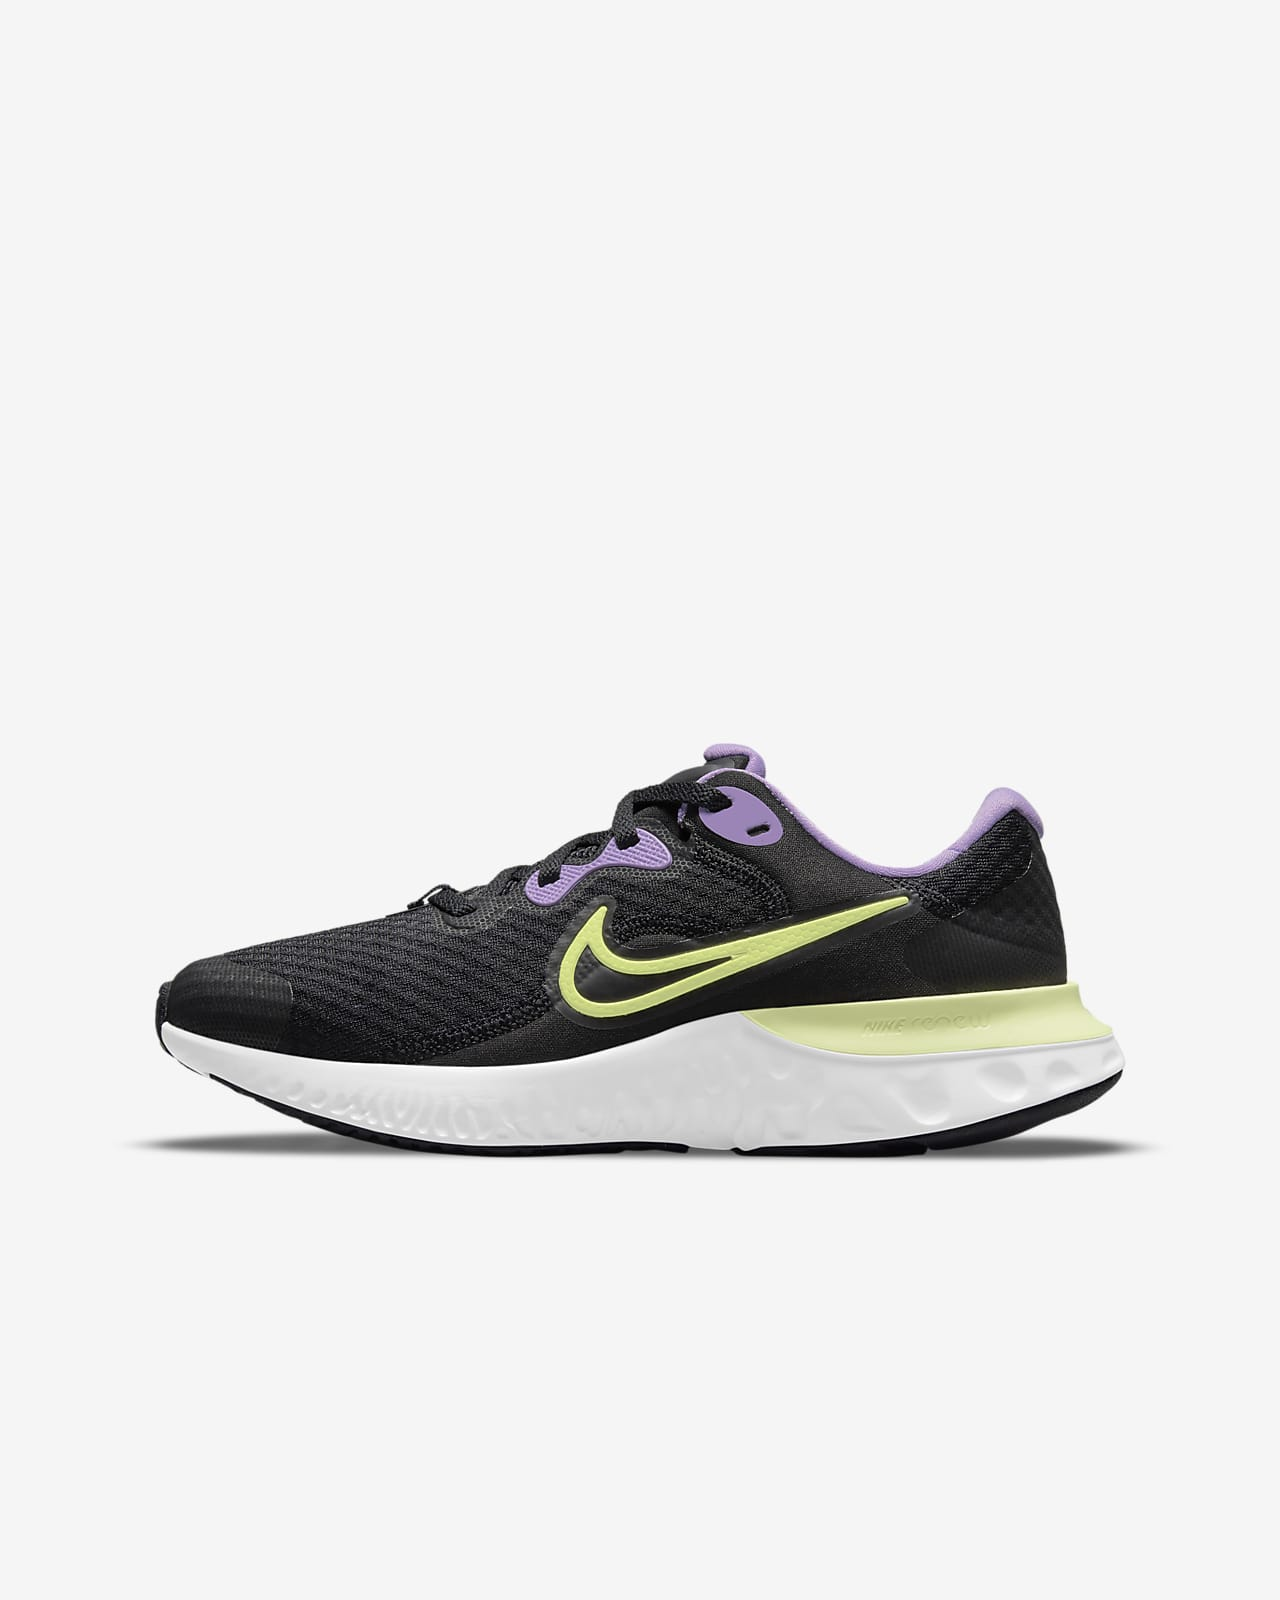 Nike Renew Run 2 Straßenlaufschuh für ältere Kinder